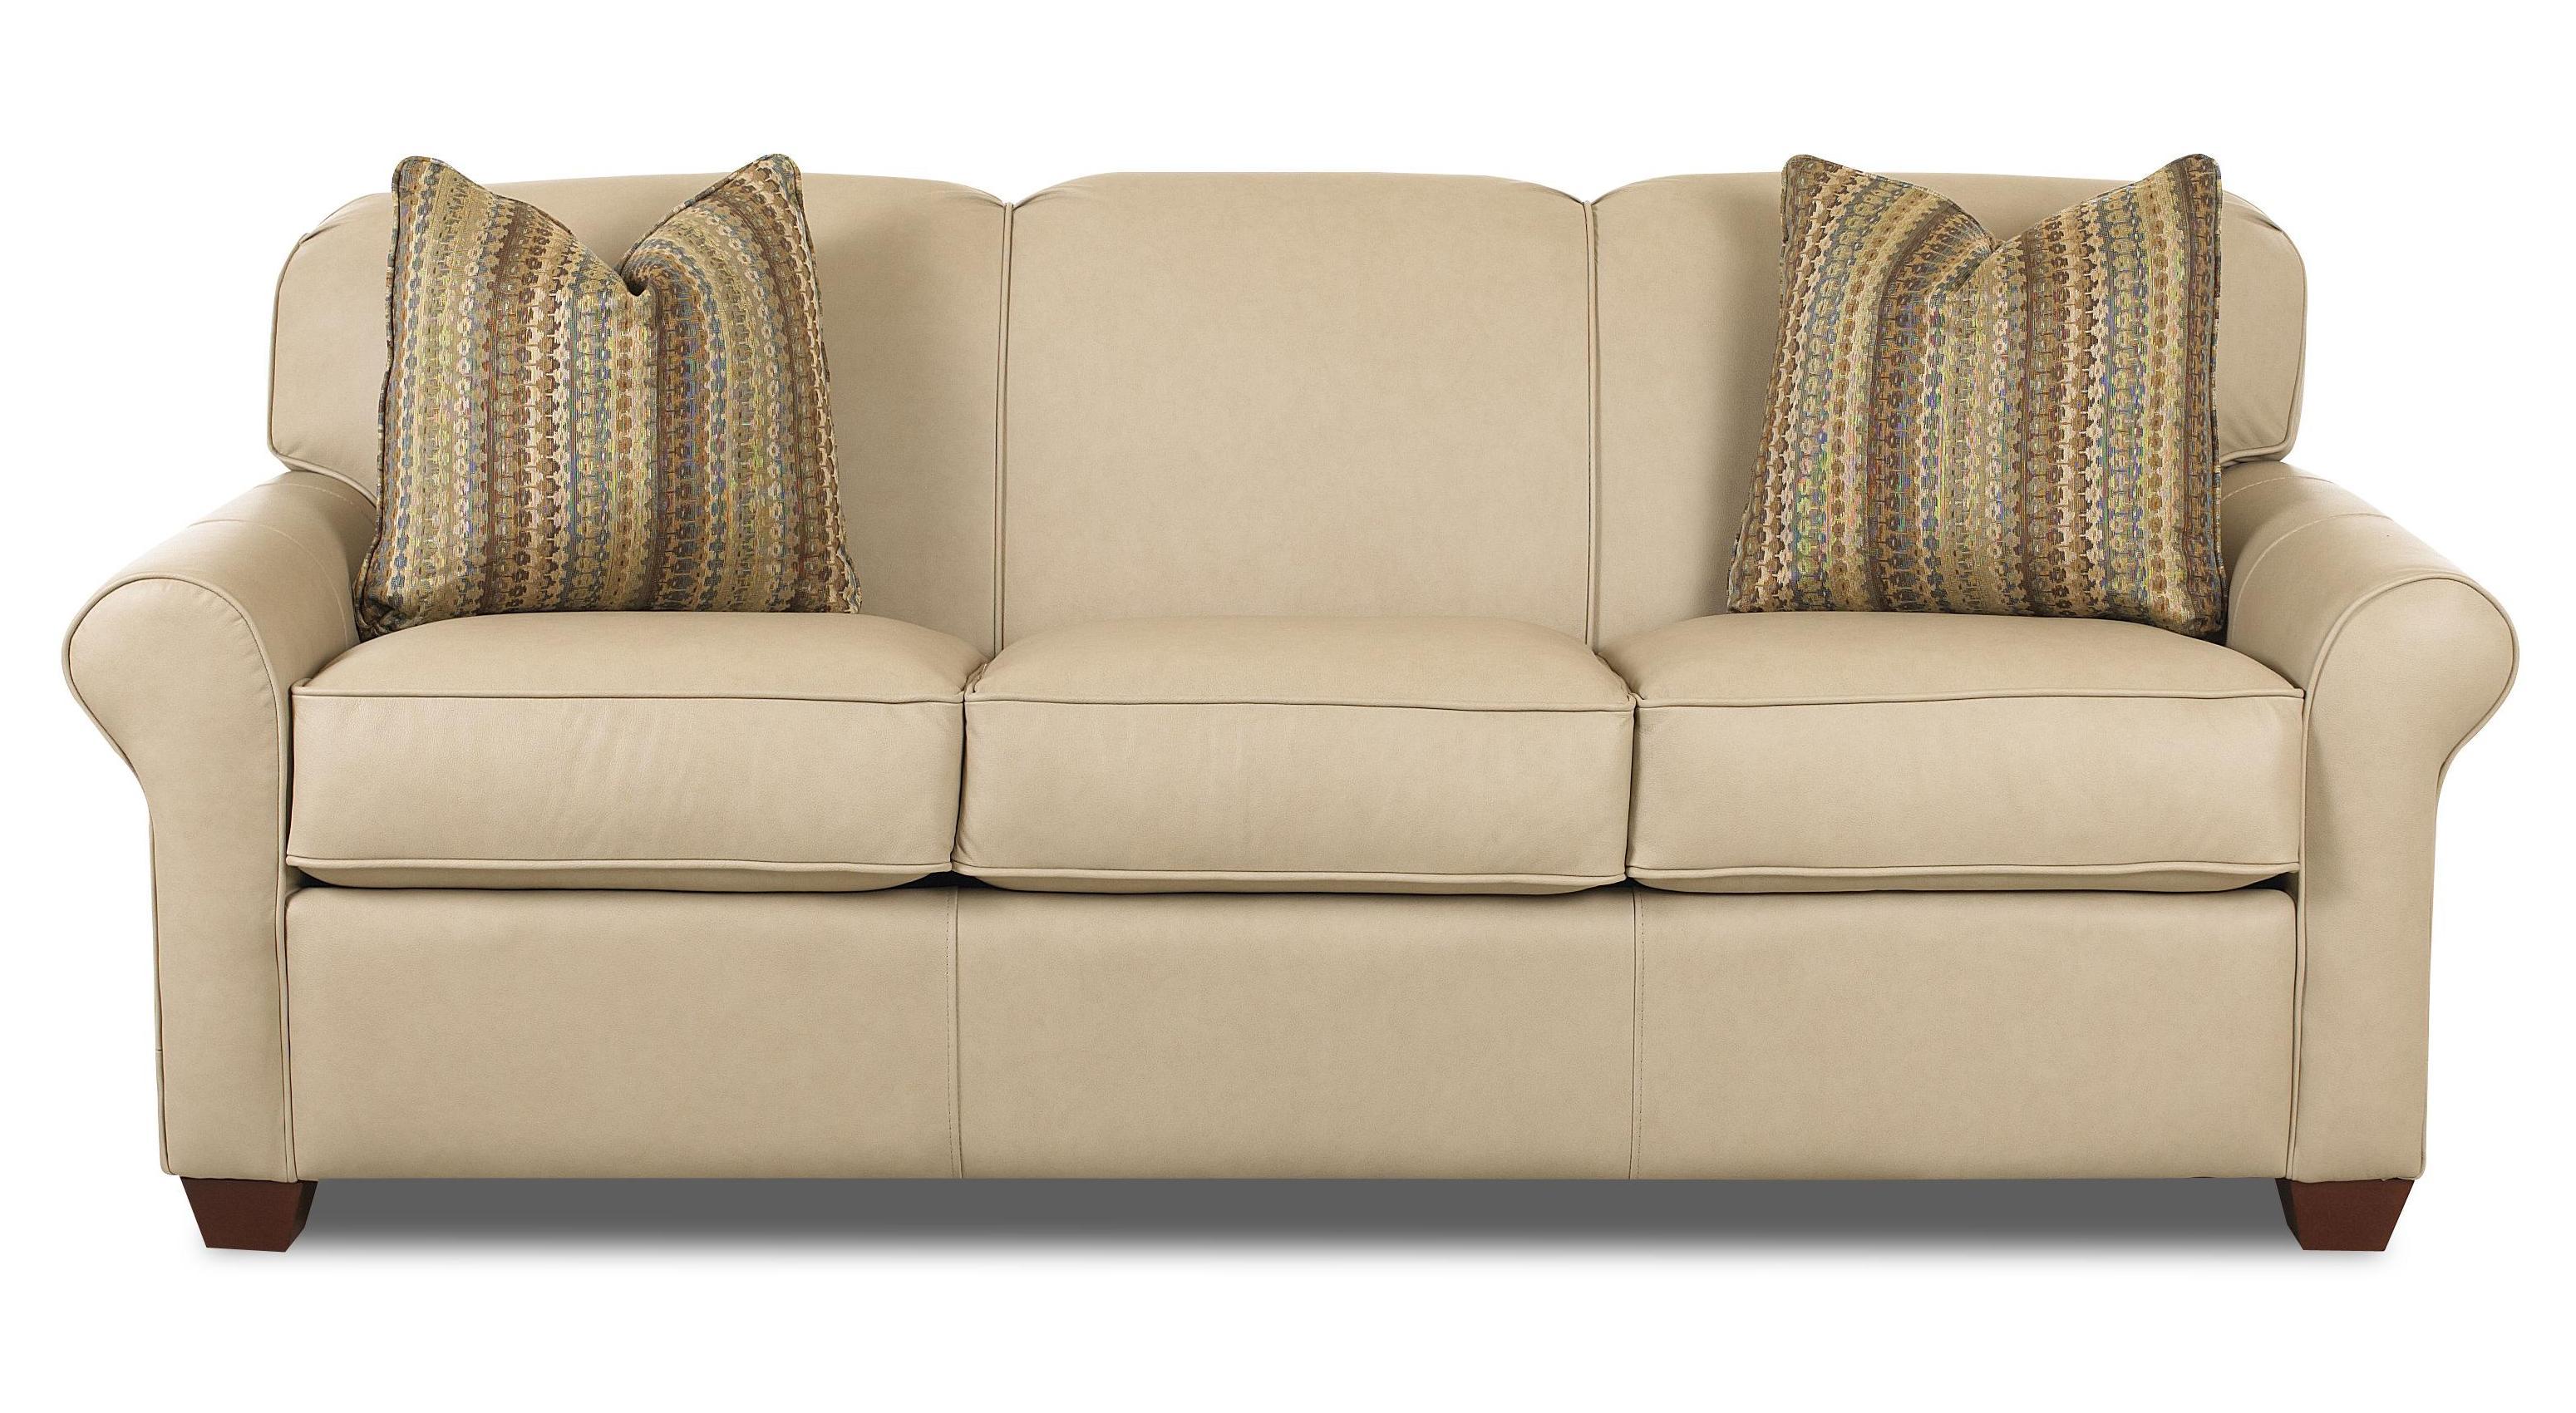 Klaussner Mayhew 97900 IQSL Innerspring Queen Sleeper Sofa ...